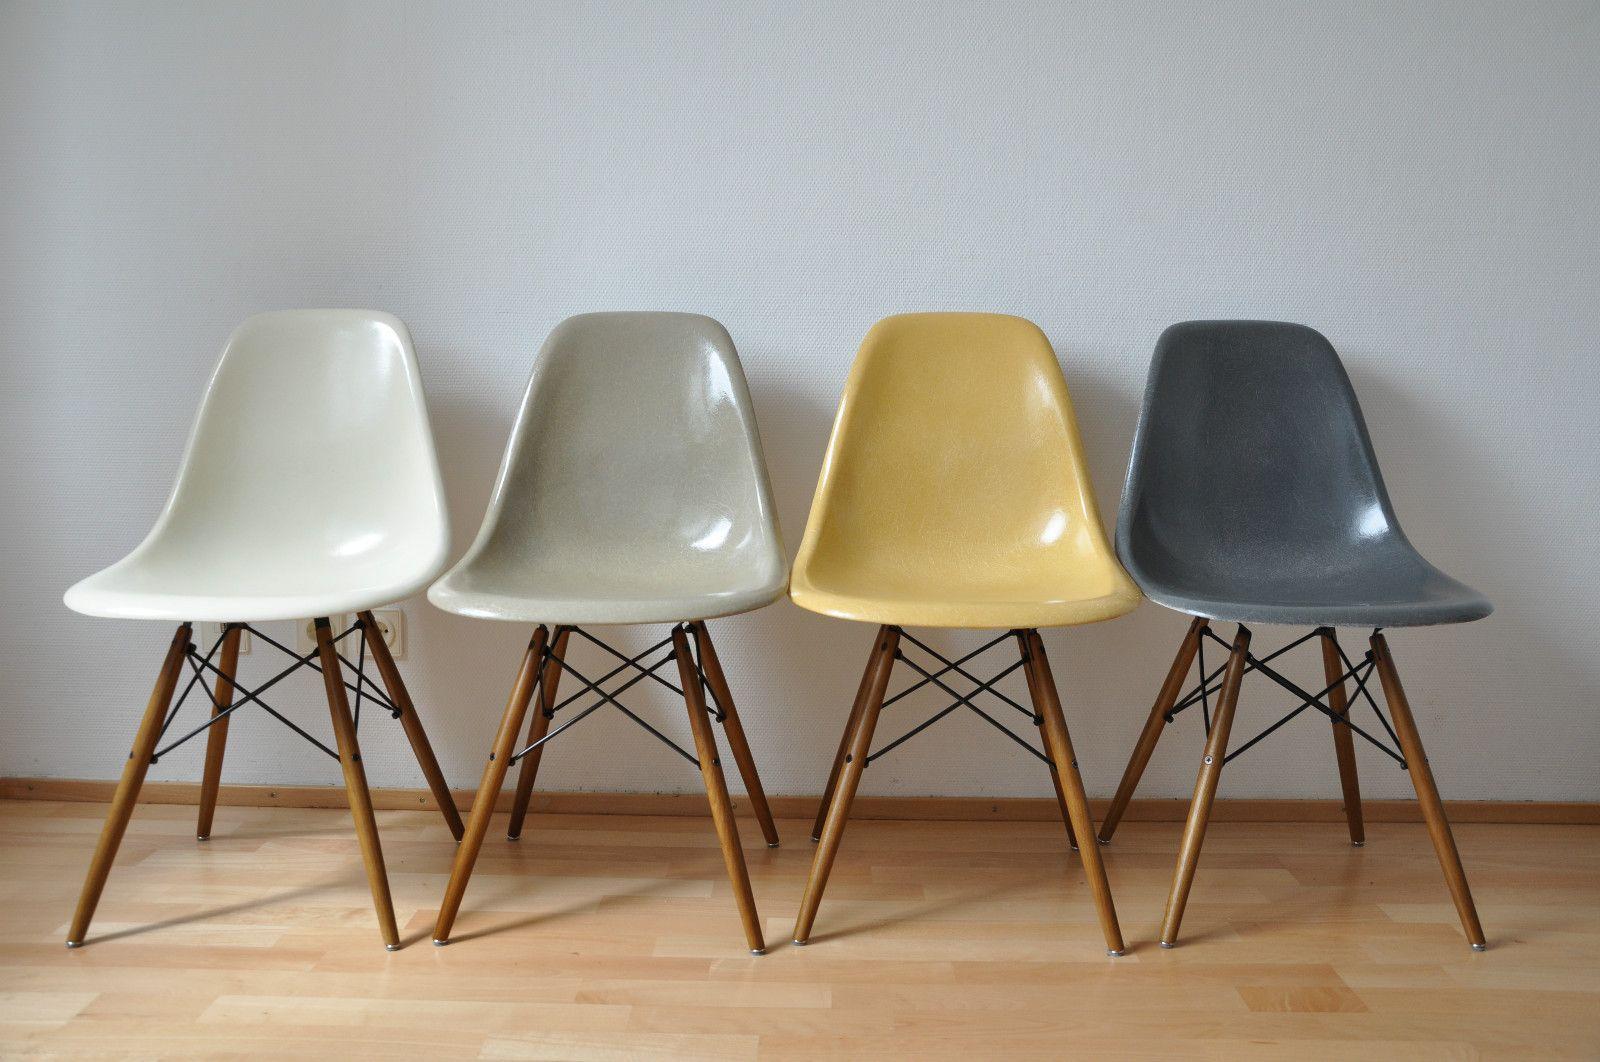 Eames   HERMAN MILLER   VITRA, 4x chairs , Stuhle aus ...